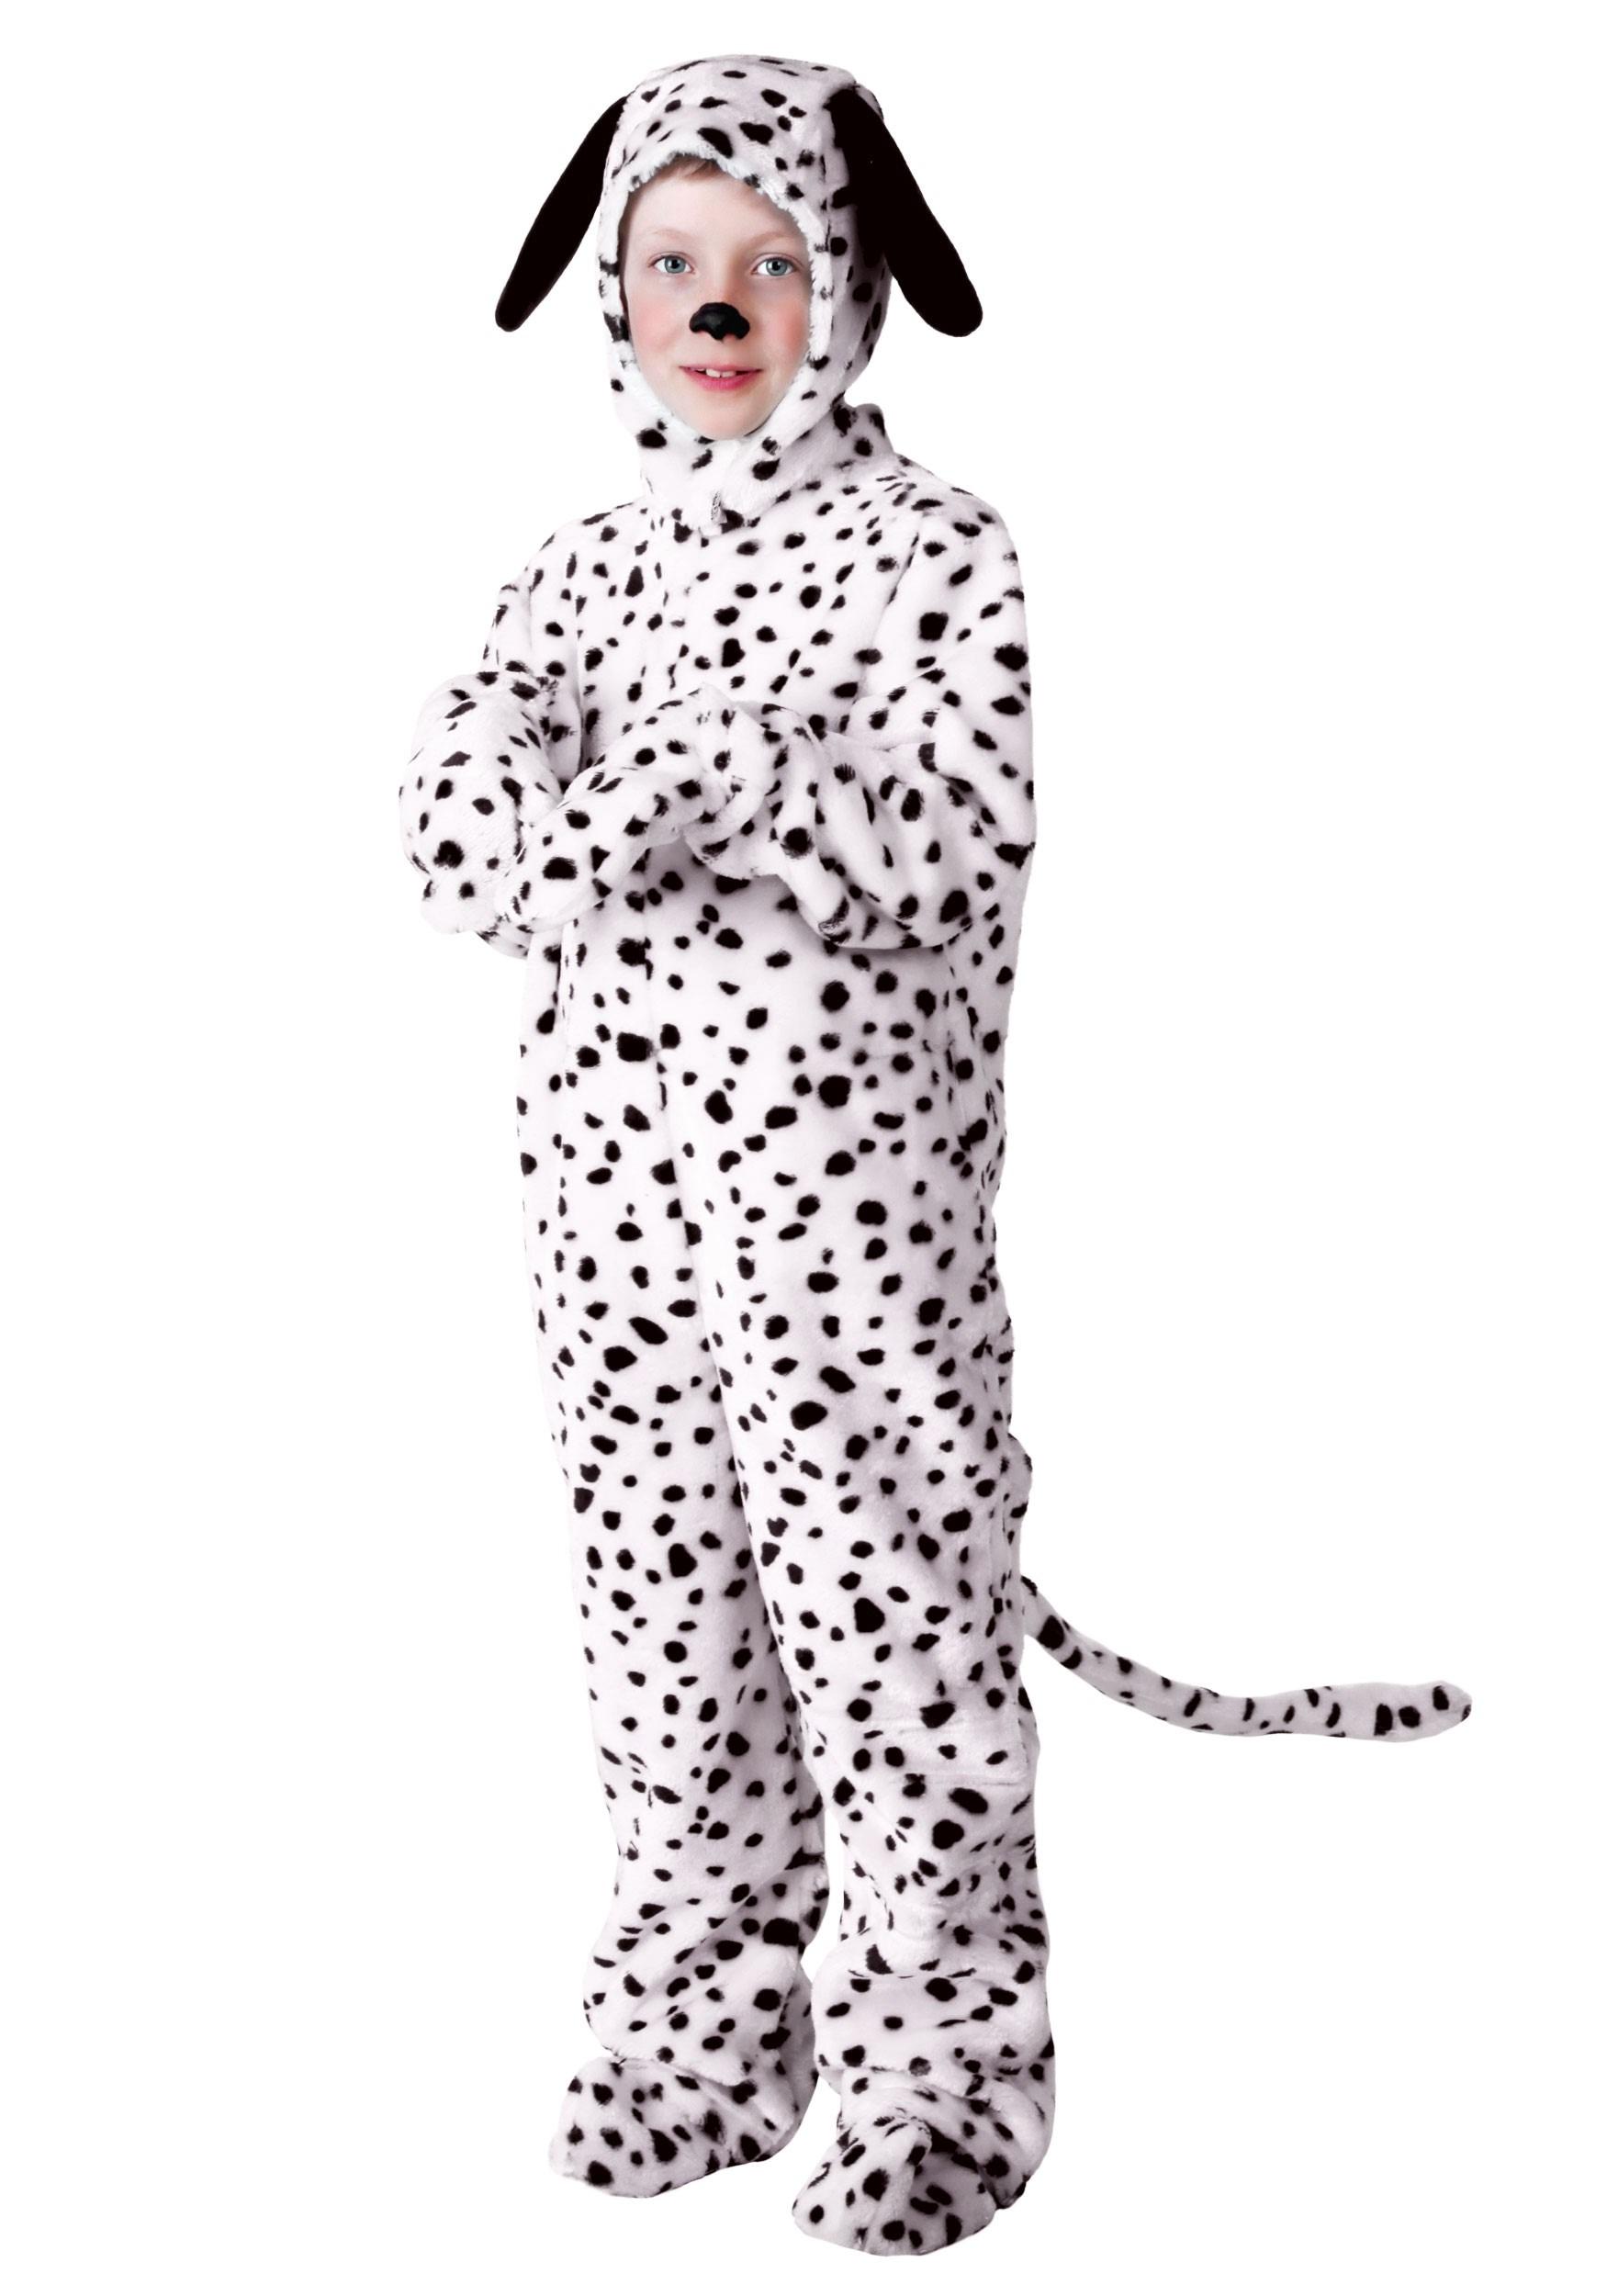 Dalmatian Costume For Kids | Dog Jumpsuit | Exclusive